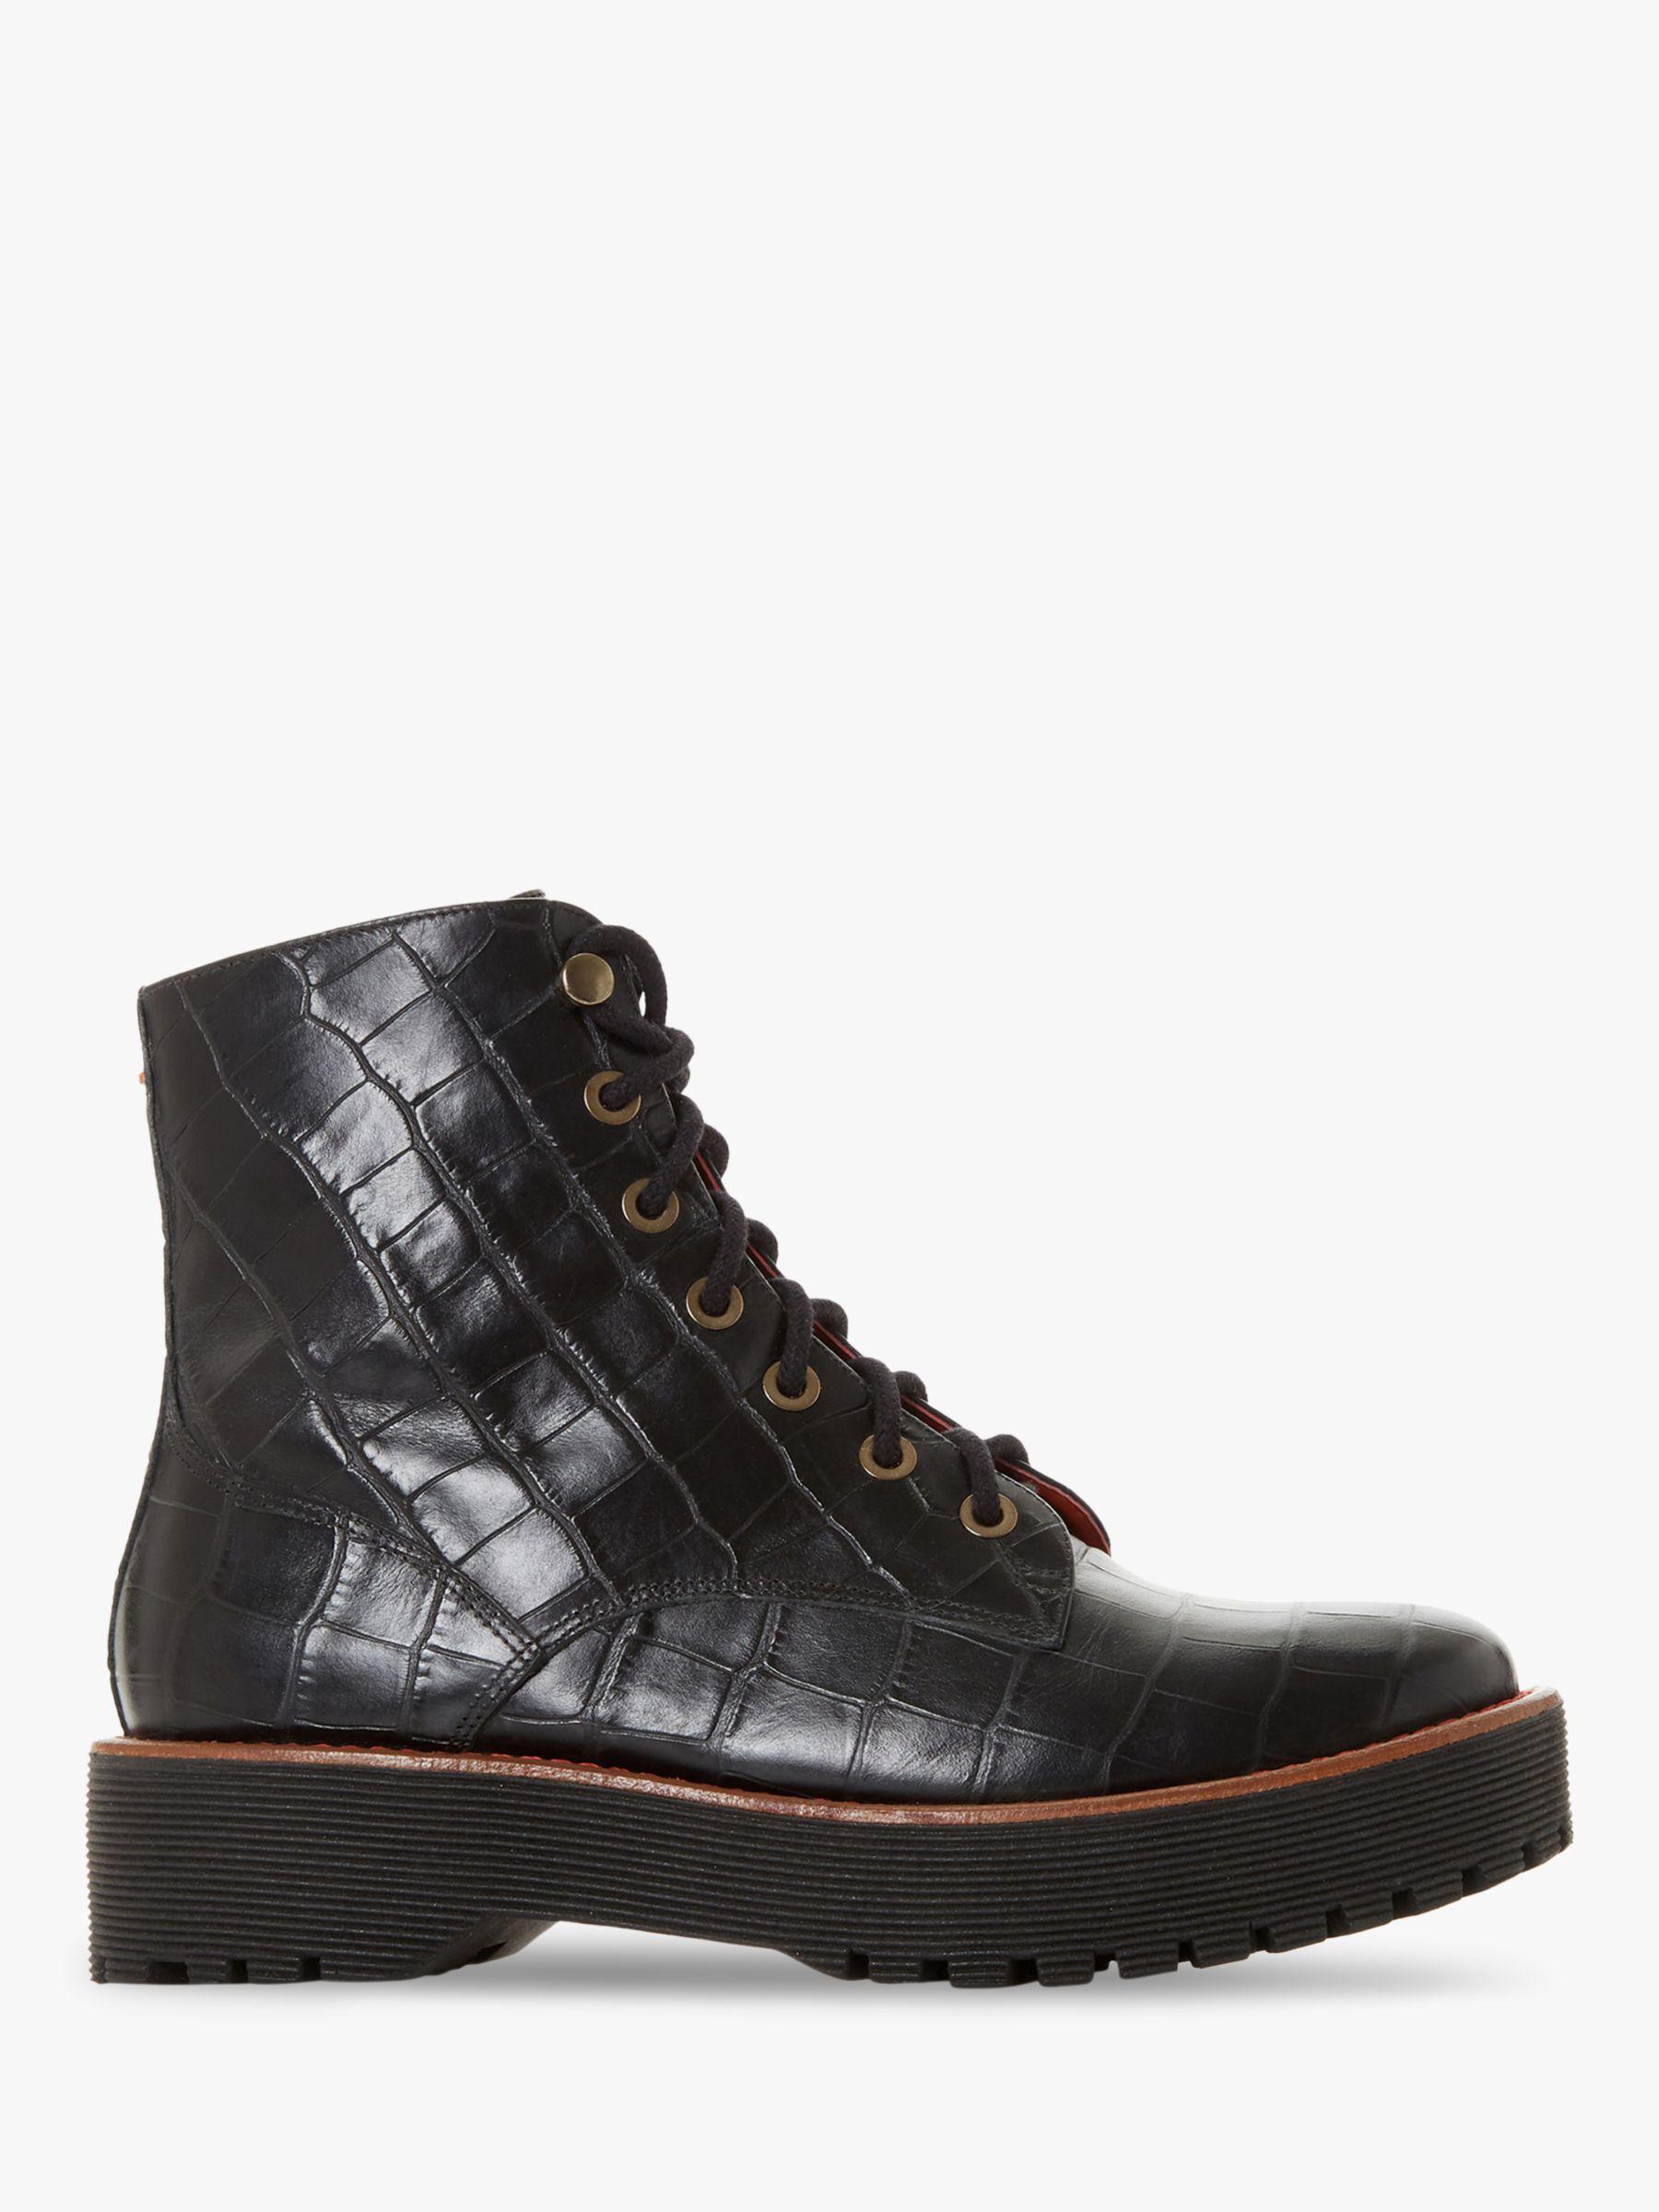 Bertie Bertie Paper Leather Textured Ankle Boots, Black Croc